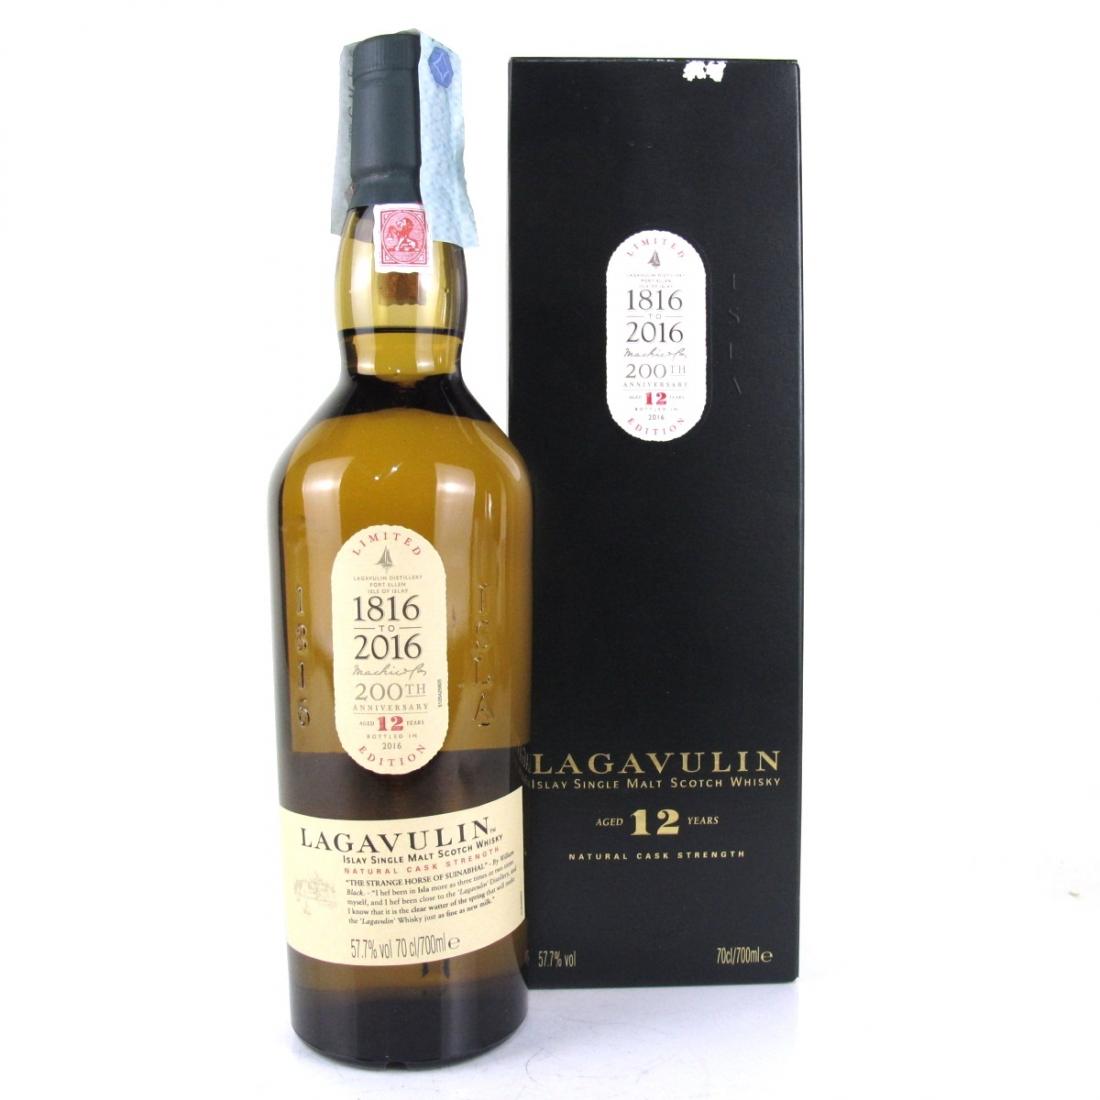 Lagavulin 12 Year Old 2016 Edition / Bicentenary